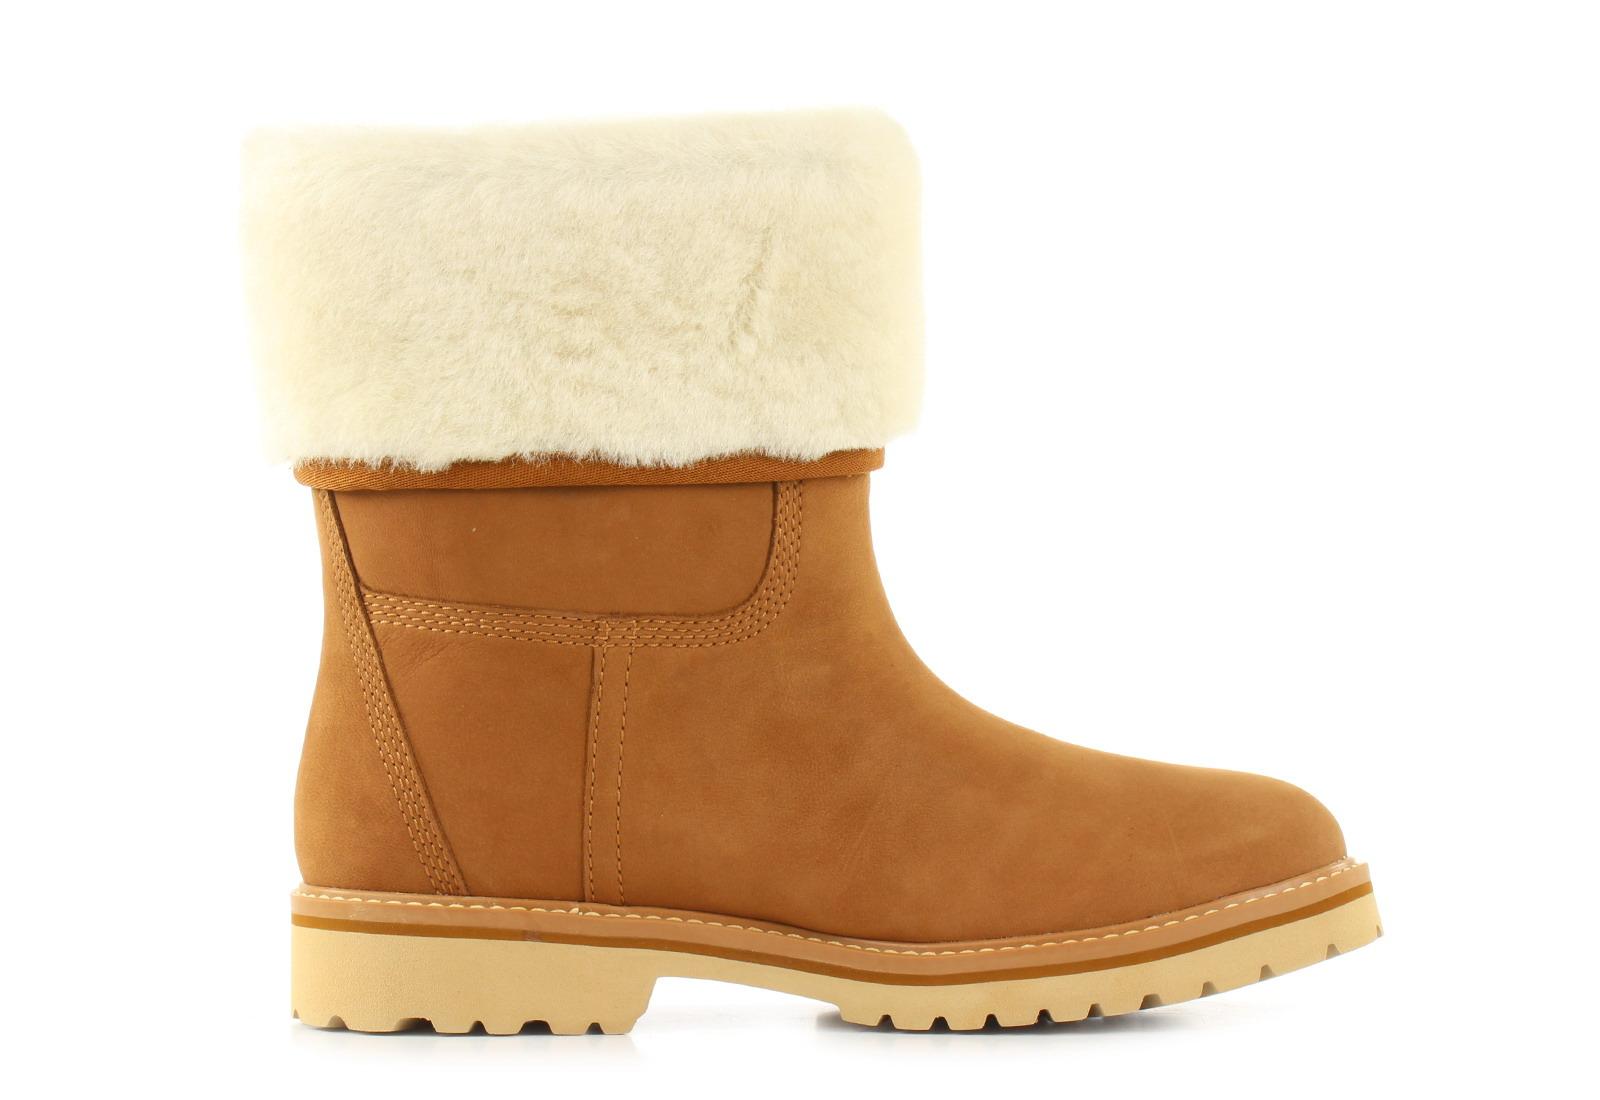 8d93595ac4f16 Timberland Boots - Chamonix Valley Wp - A1SAK-sad - Online shop for ...